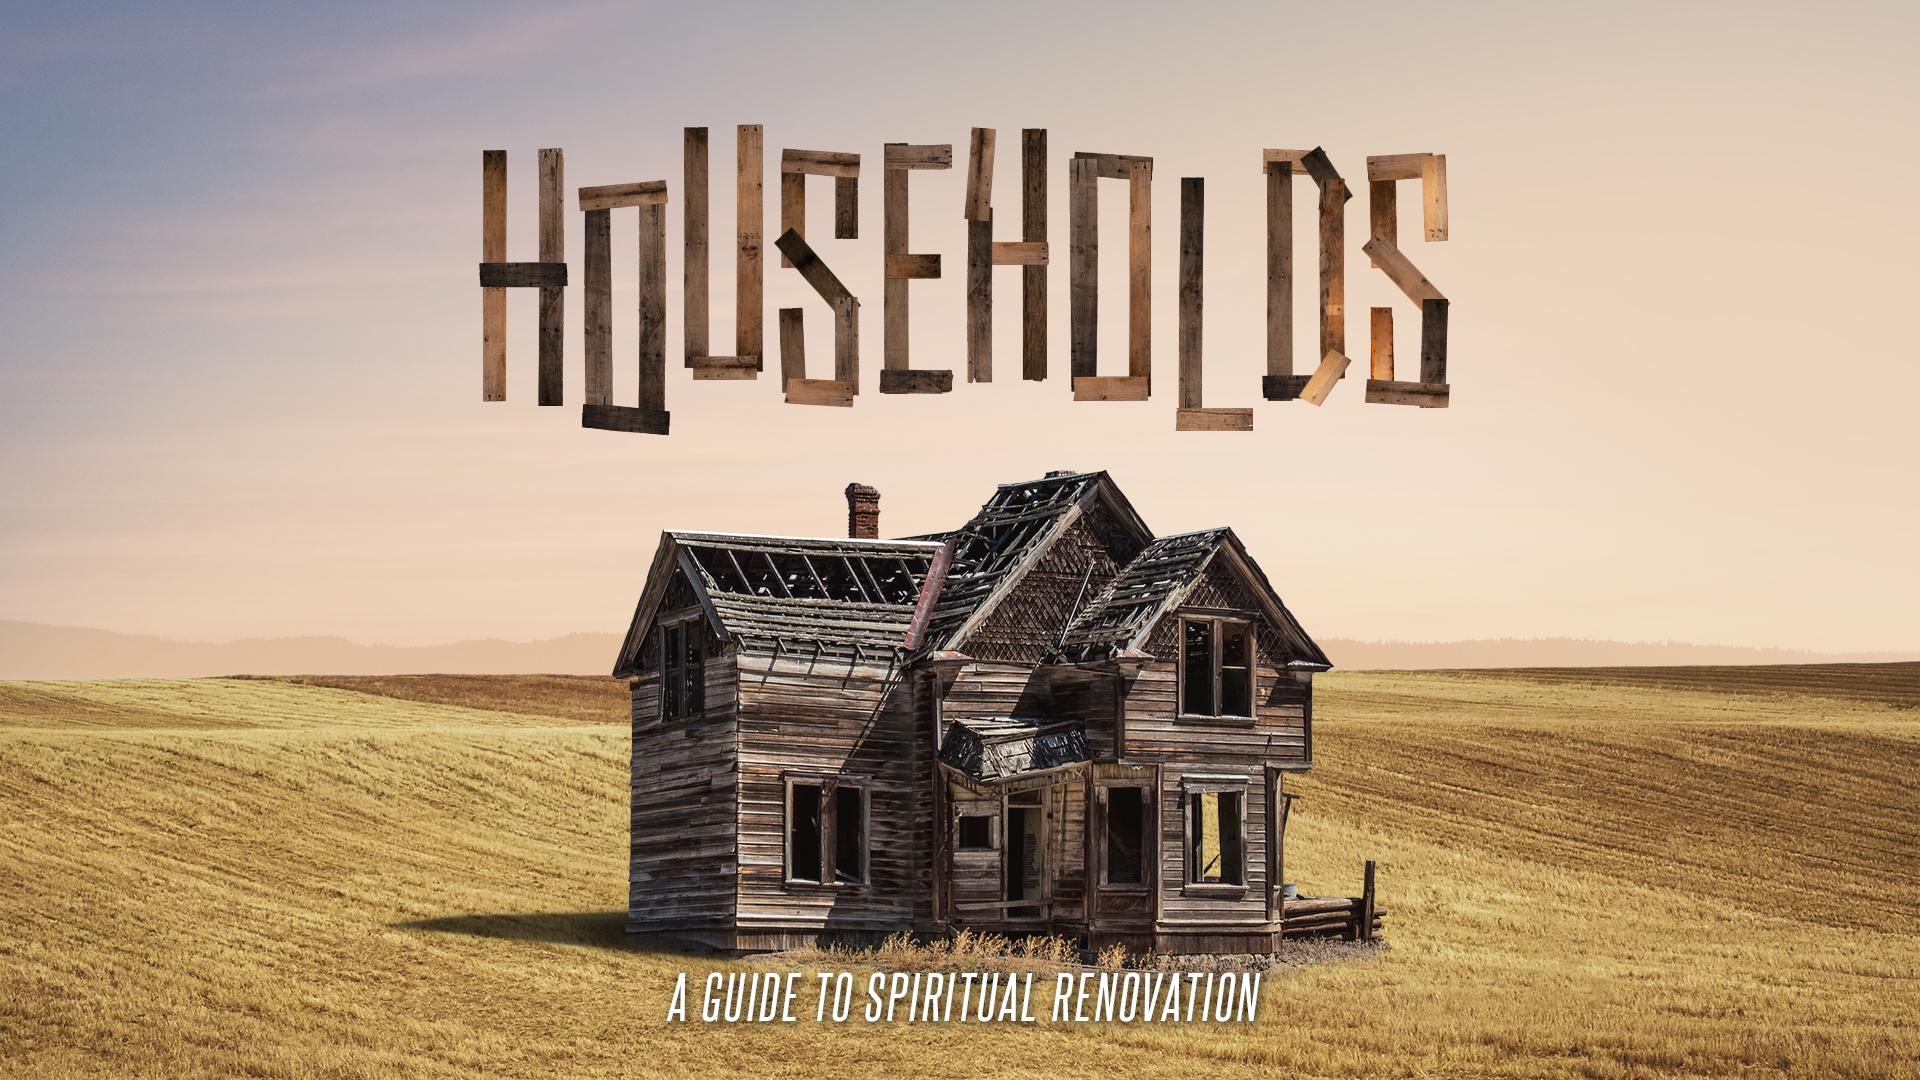 HOUSEHOLDS Series w Subtitle 1920x1080.jpg